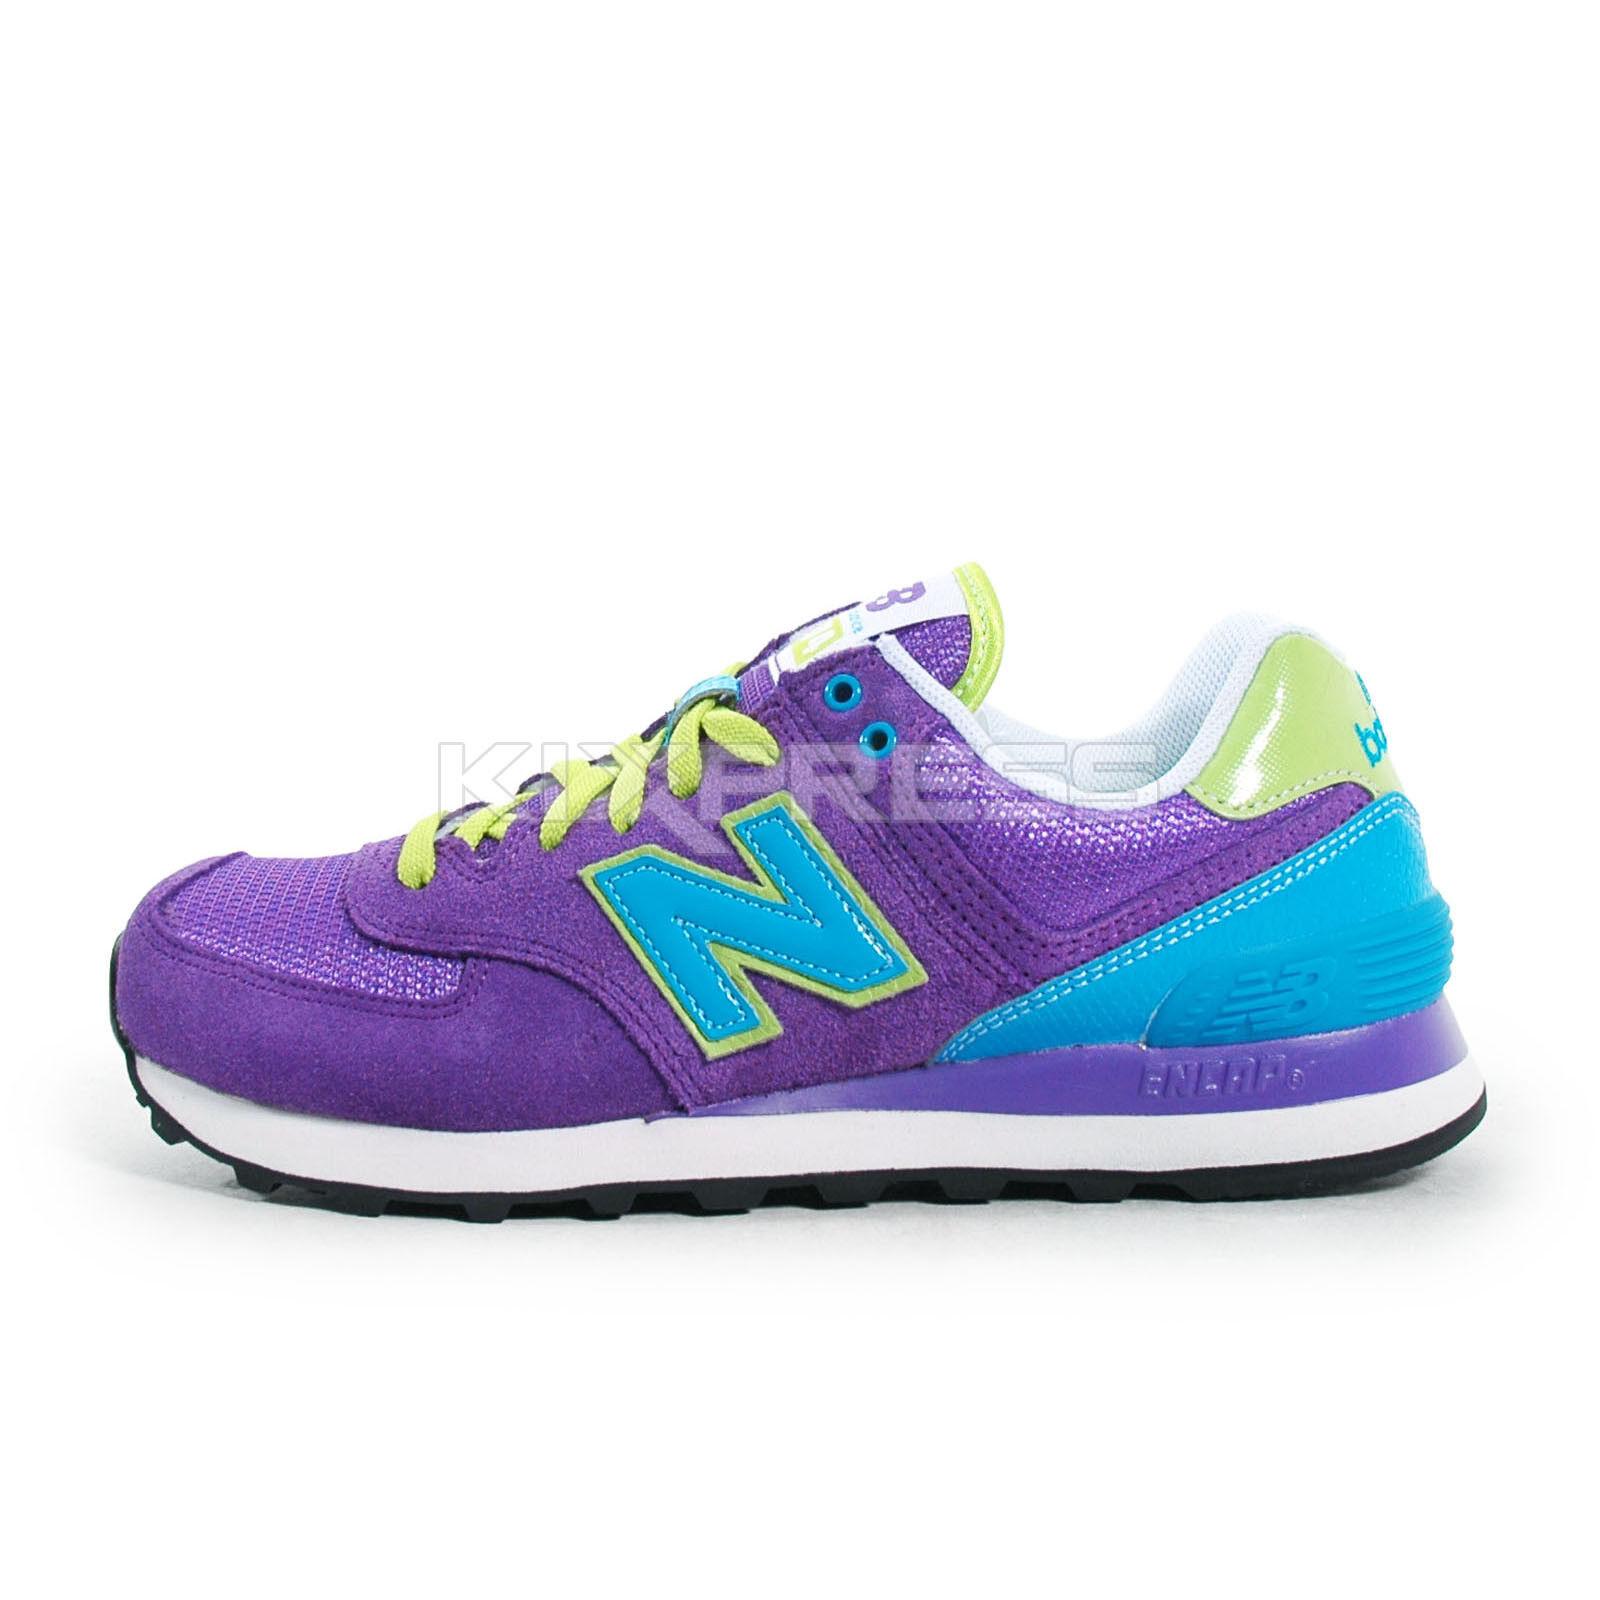 New Balance WL574 [WL574BFU] Classic Running Purple/Turquoise